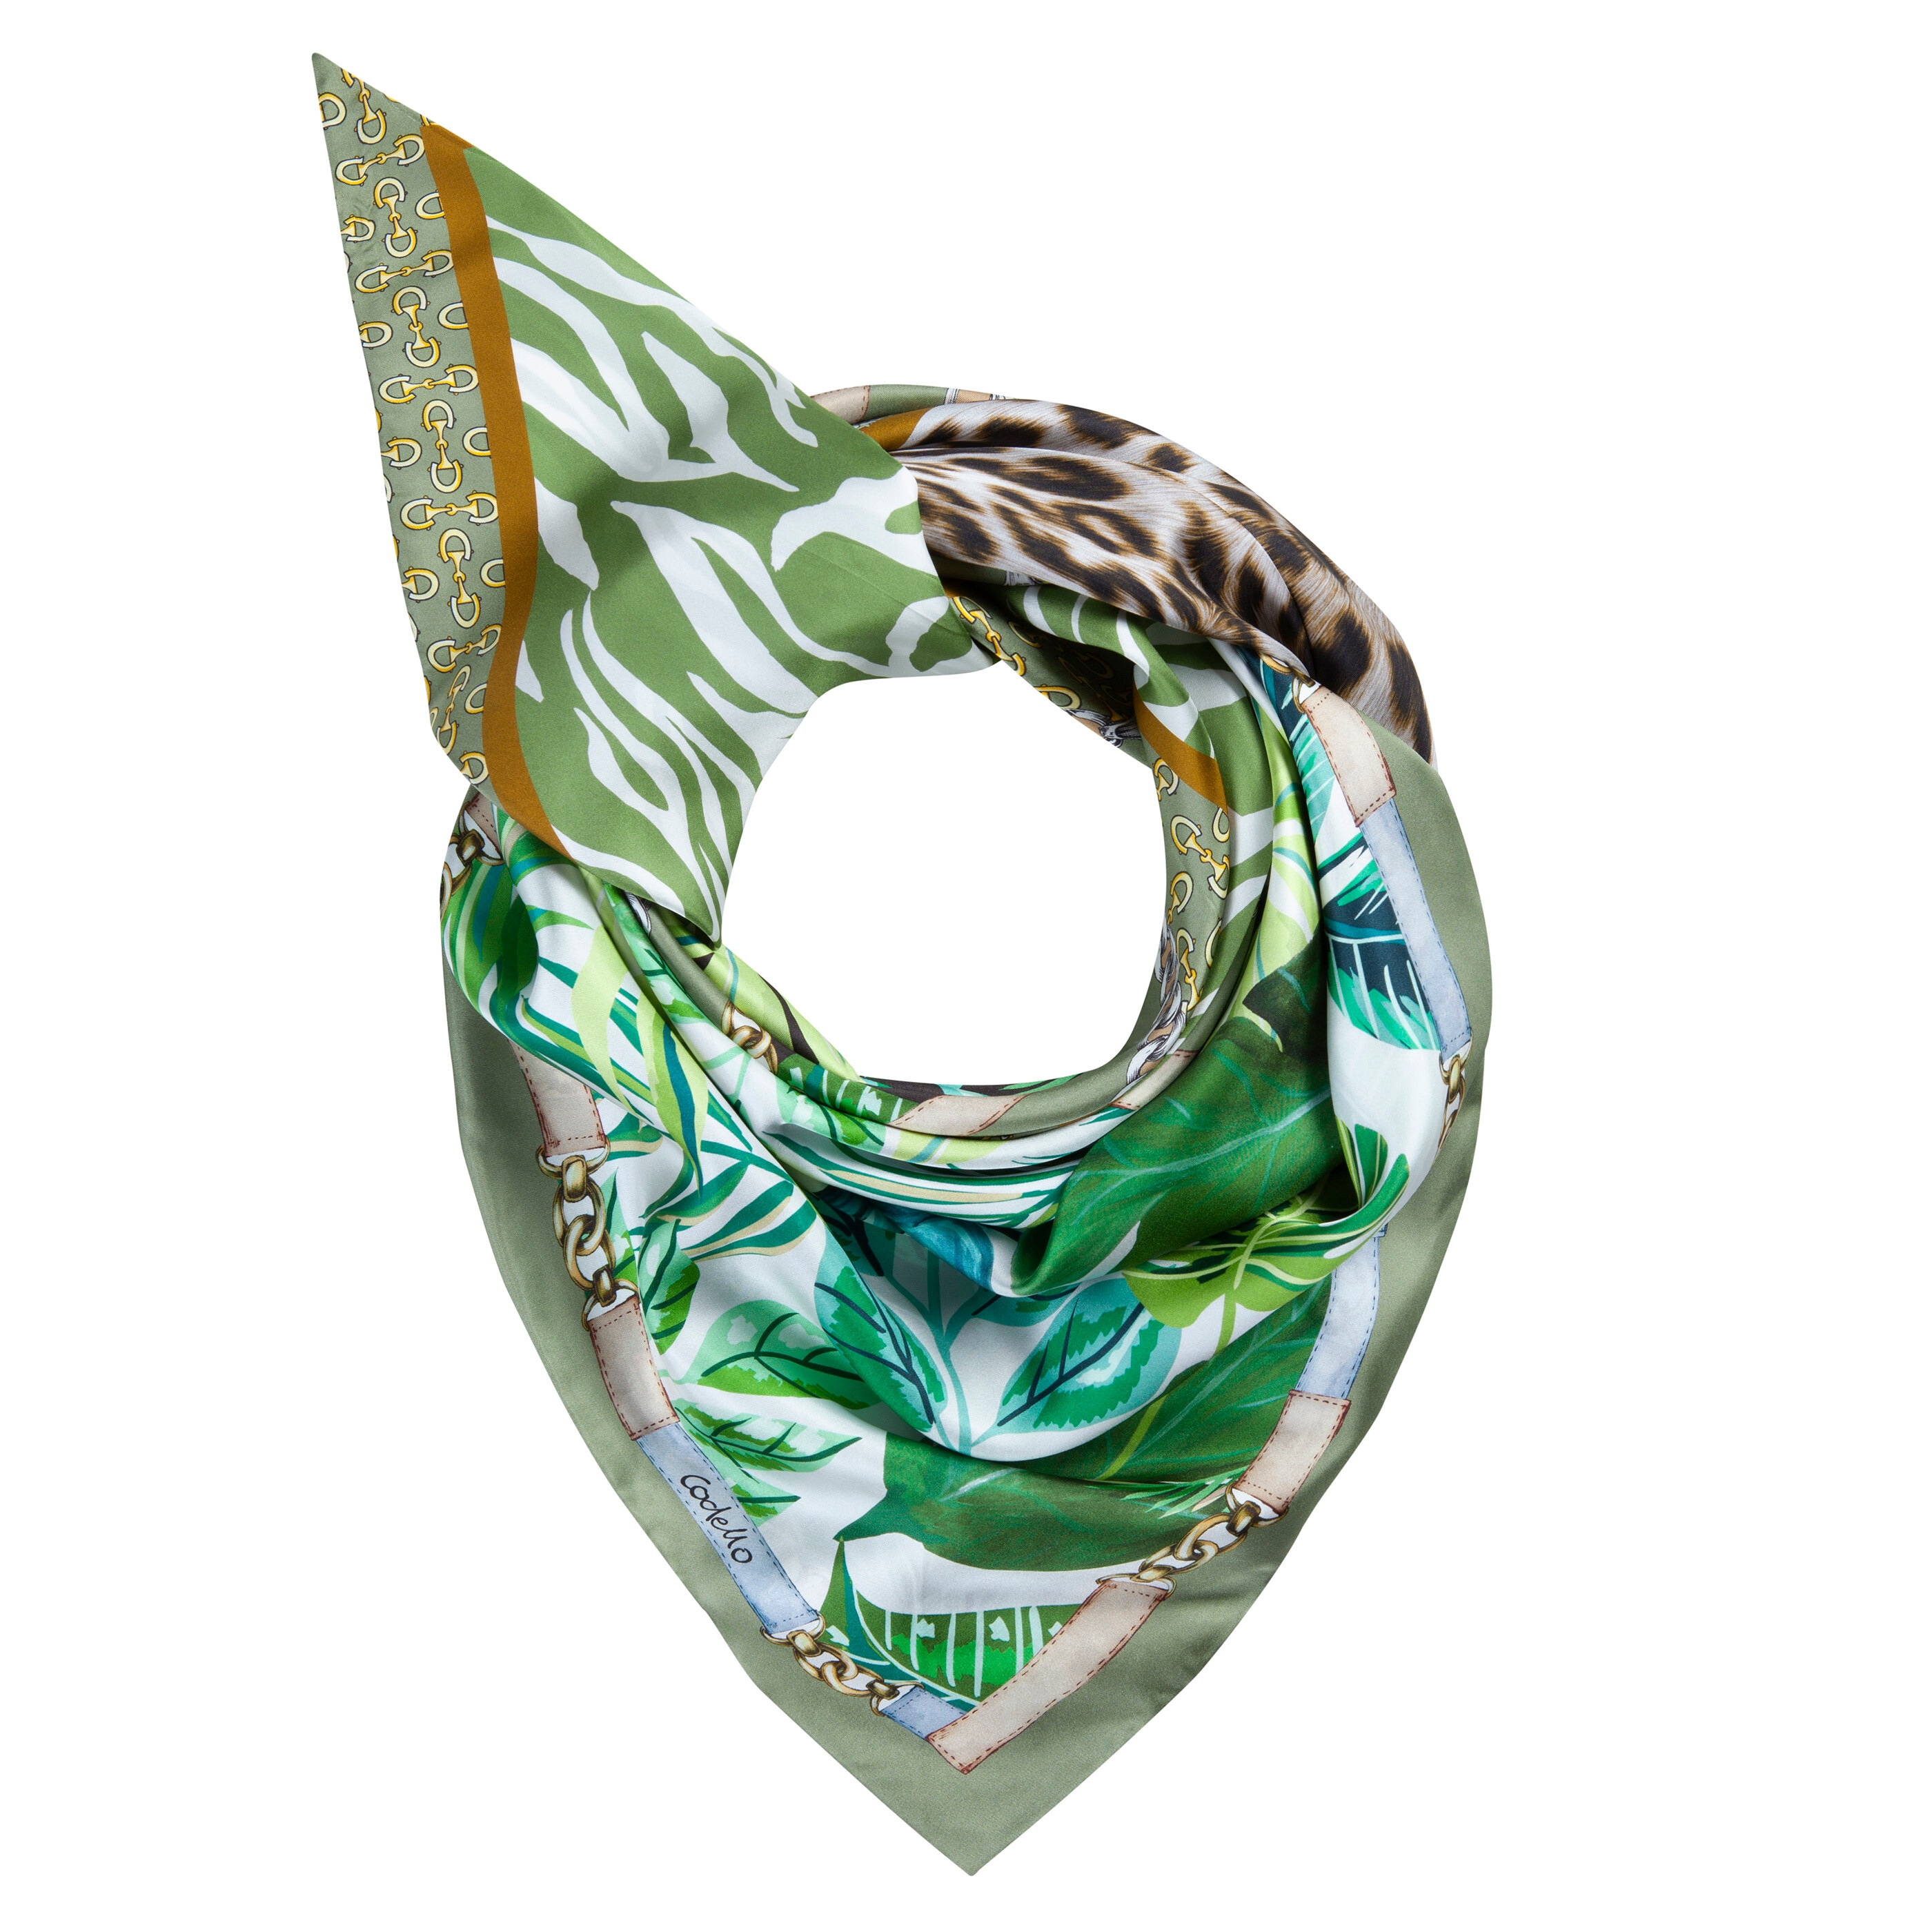 Codello Dreieckstuch, aus reiner Seide mit Logo-Print grün Damen Dreieckstuch